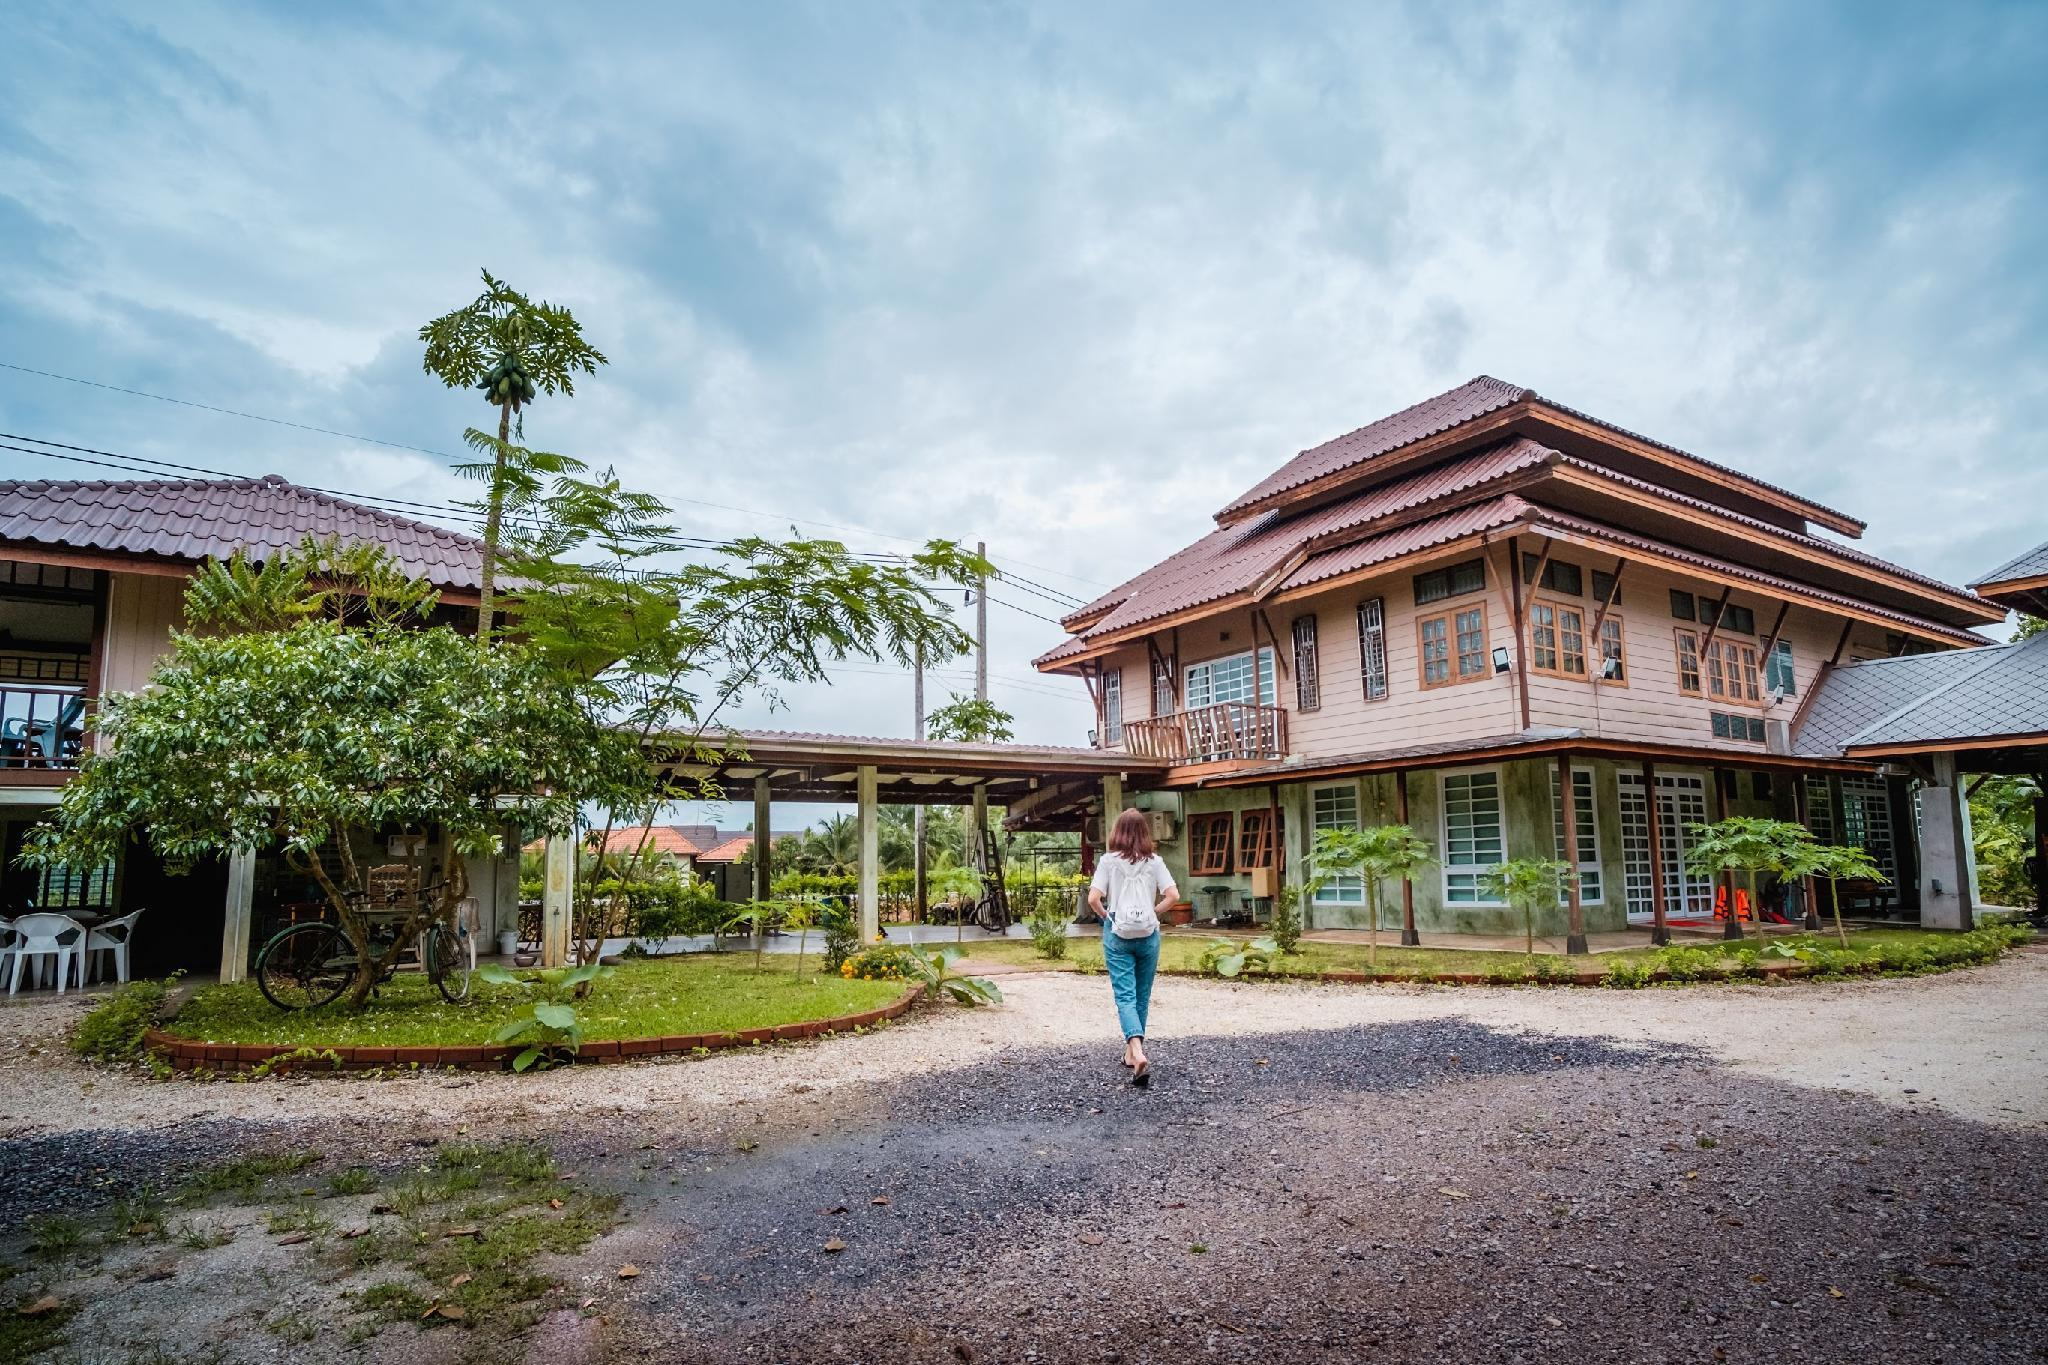 Naibara villa บ้านเดี่ยว 3 ห้องนอน 3 ห้องน้ำส่วนตัว ขนาด 100 ตร.ม. – ซิตี้เซ็นเตอร์